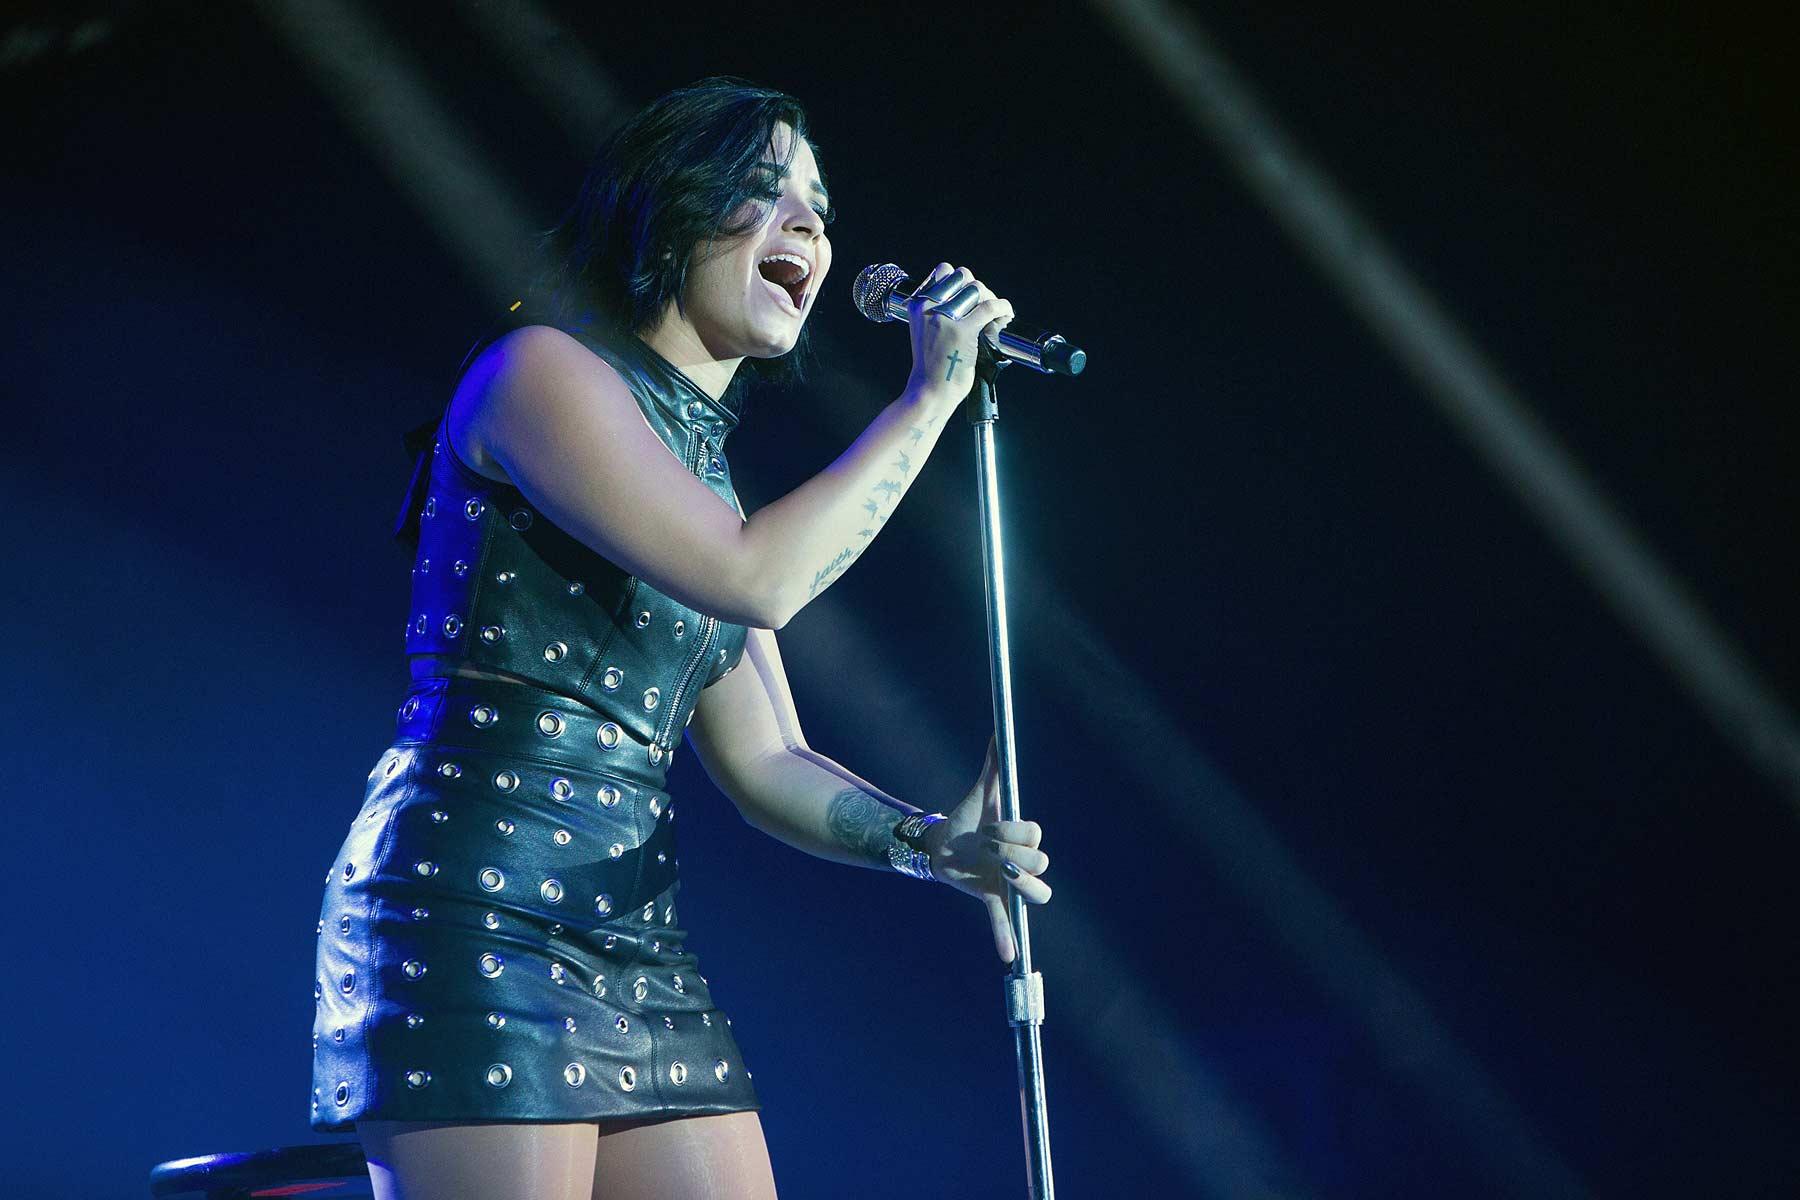 Demi Lovato performs at 106.1 KISS FM's Fall Ball